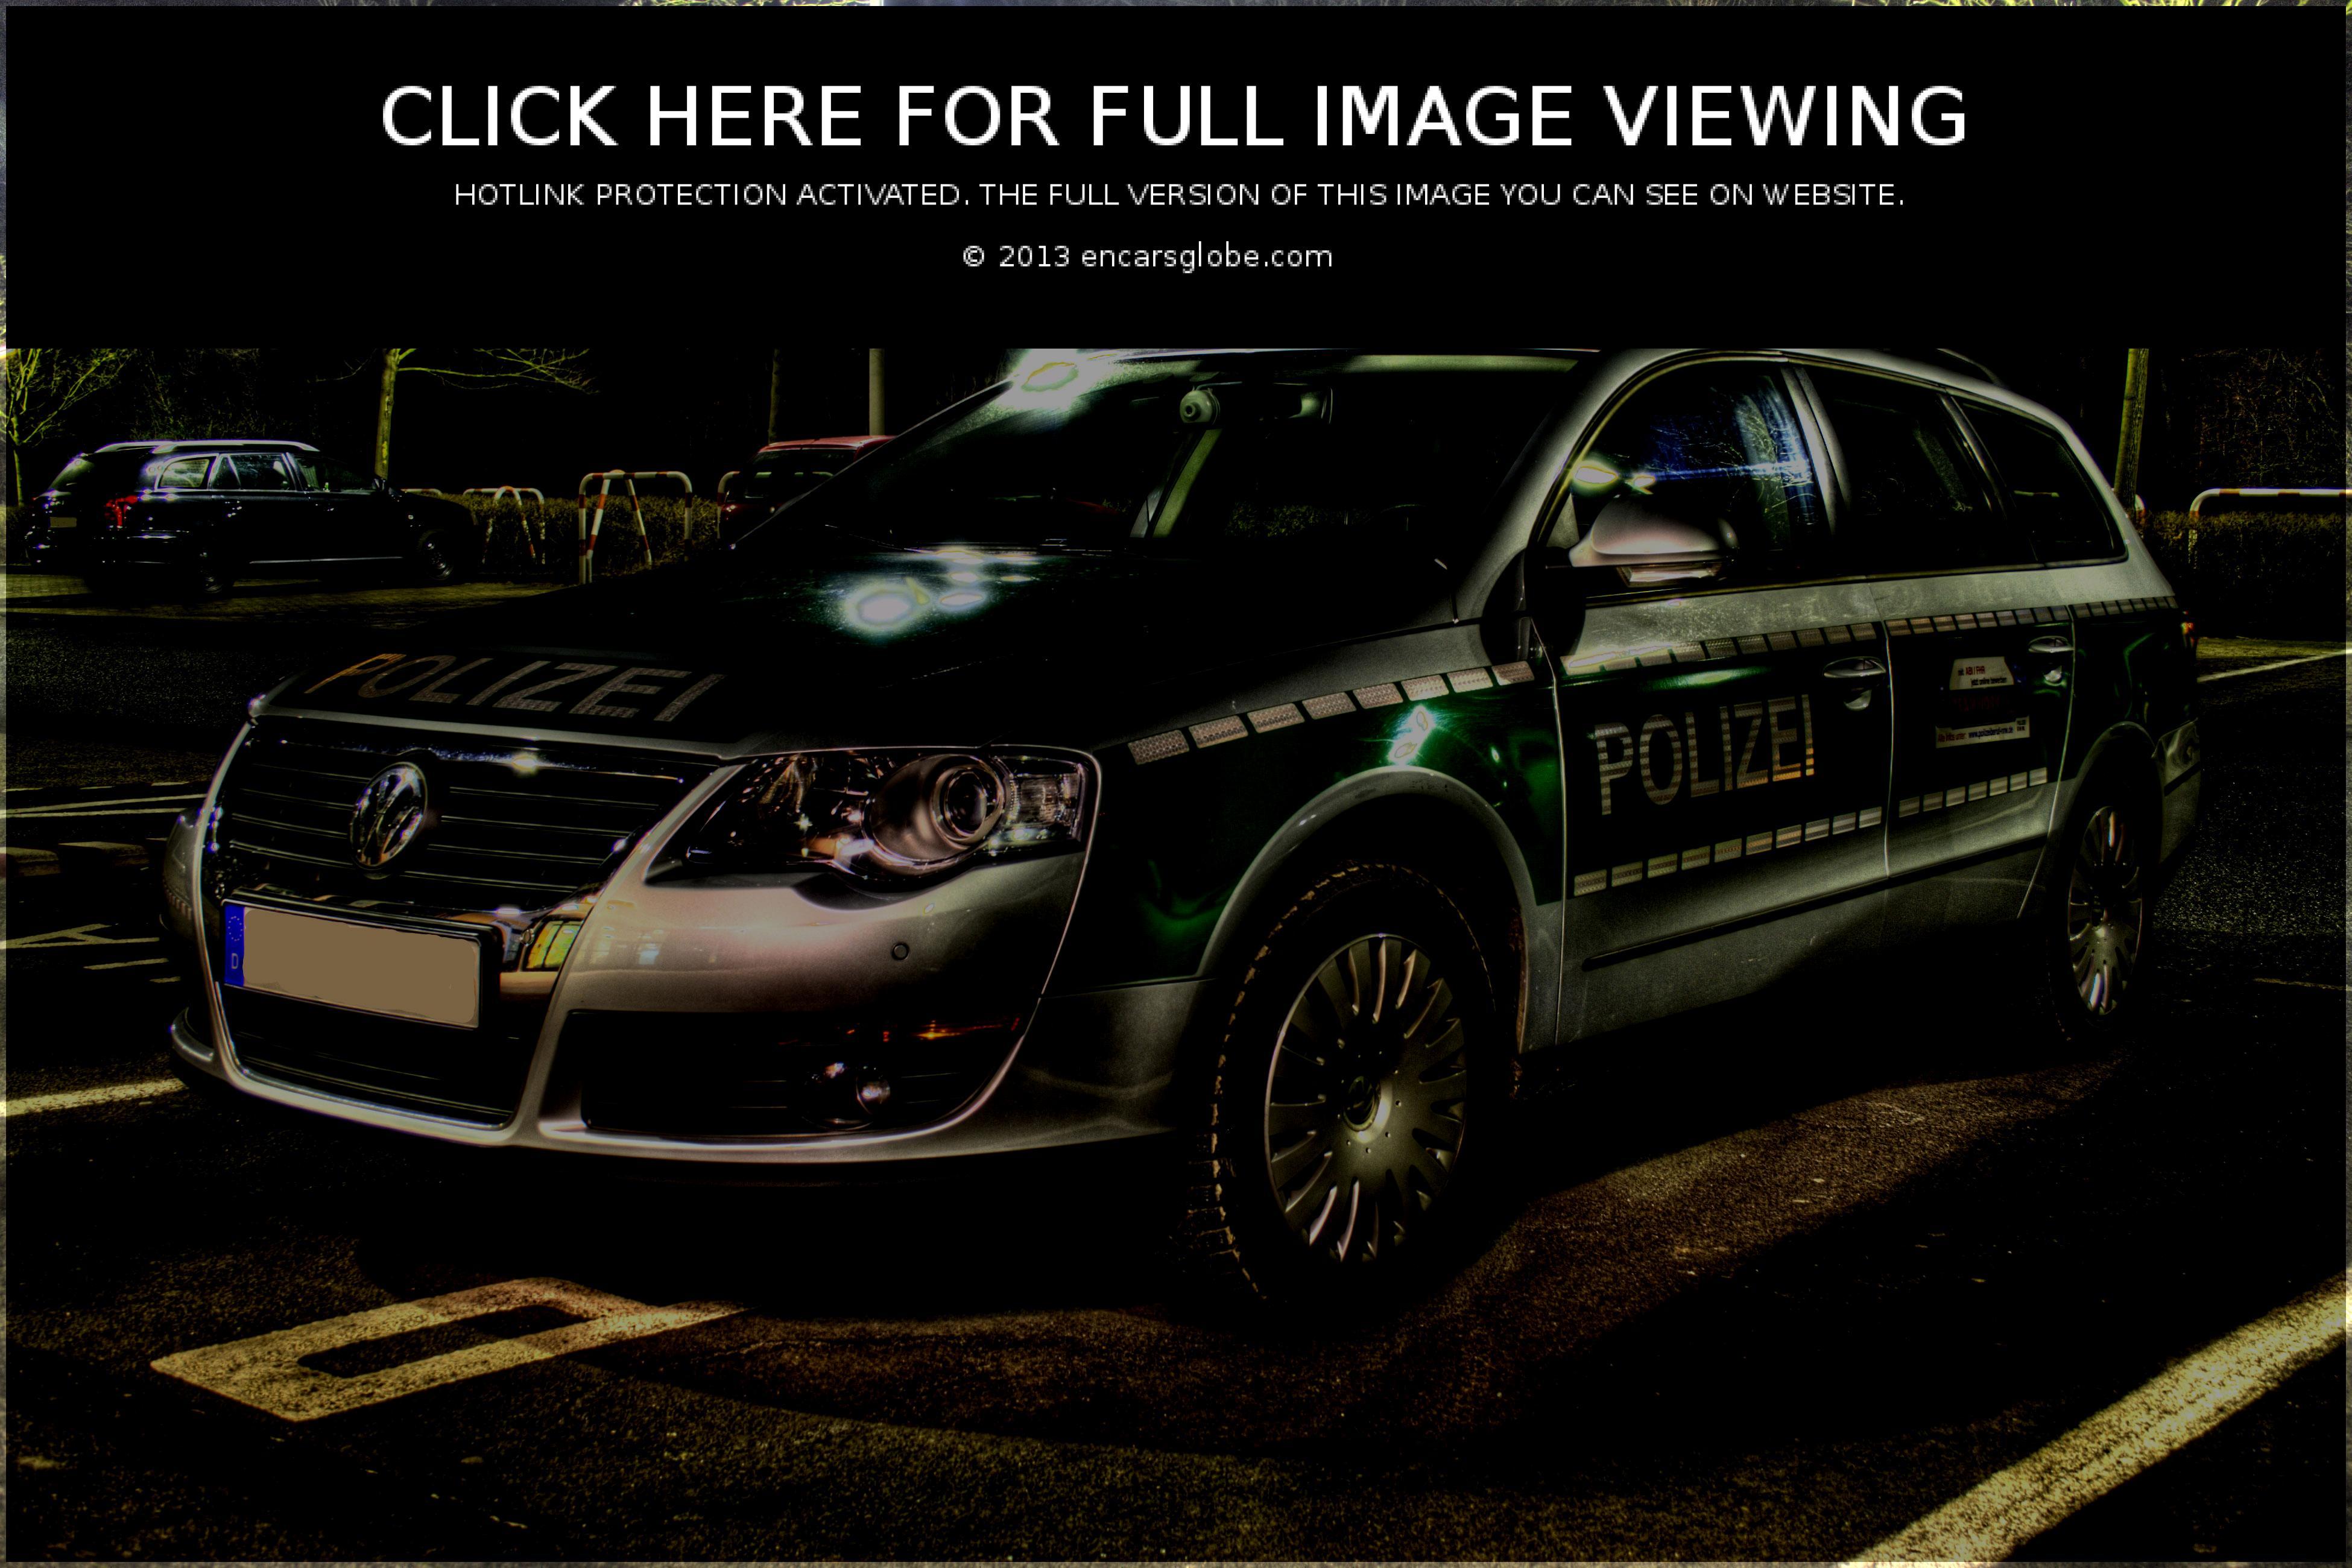 topworldauto photos of volkswagen karmann ghia typ 34. Black Bedroom Furniture Sets. Home Design Ideas